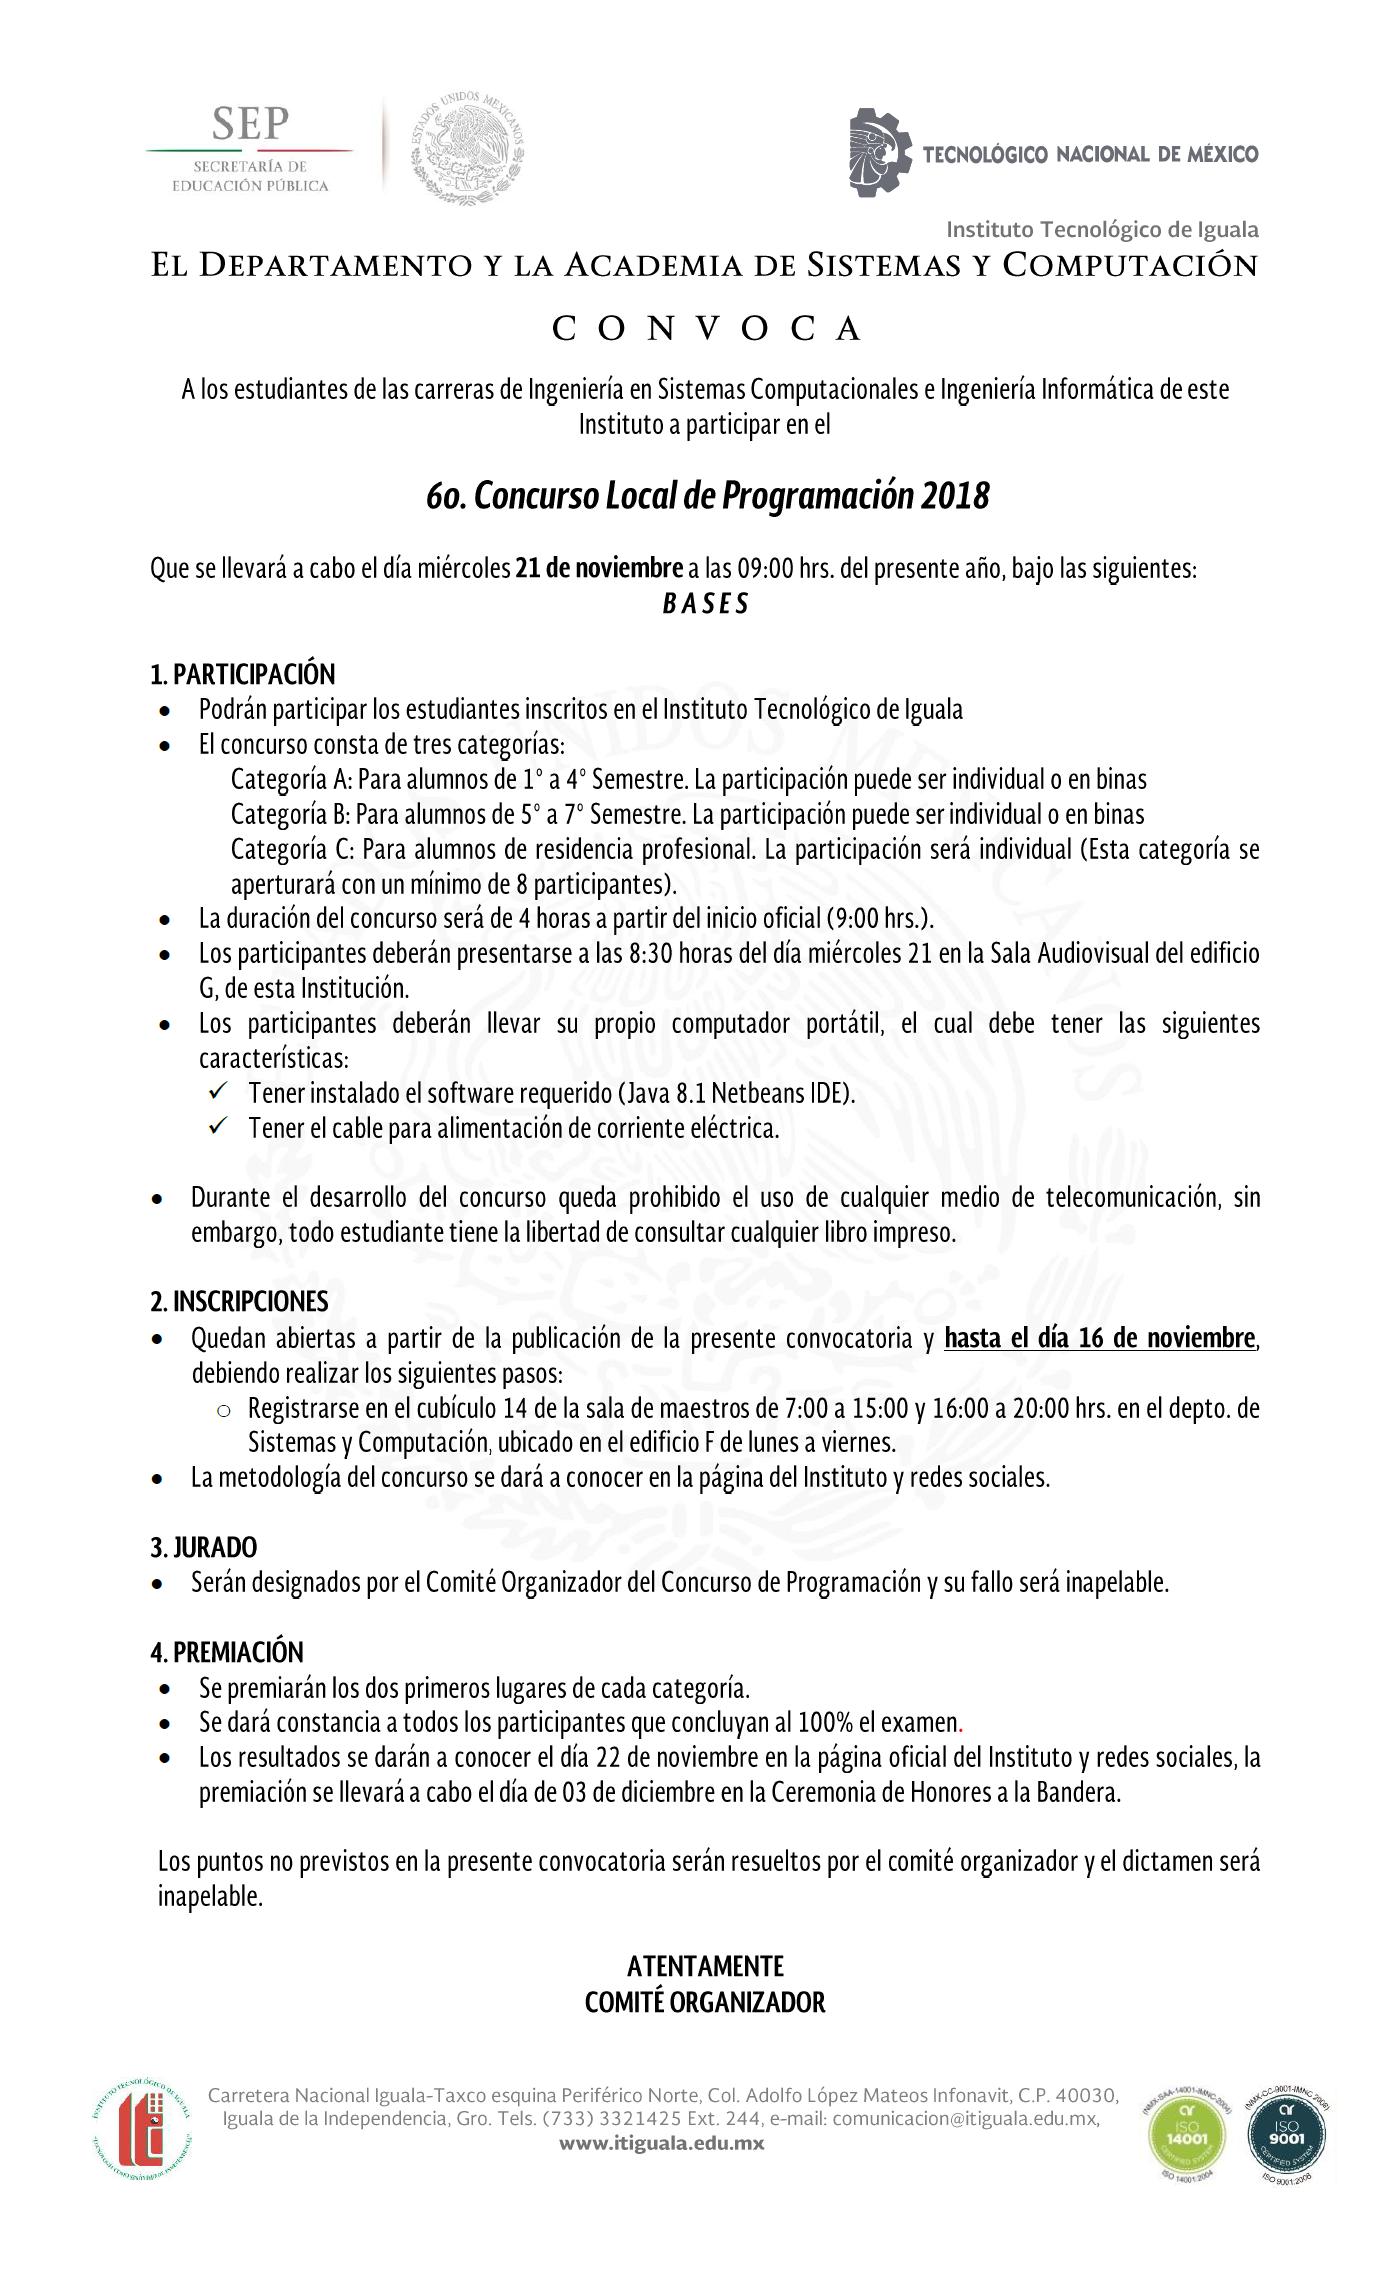 convocatoria concurso d programacion 2018